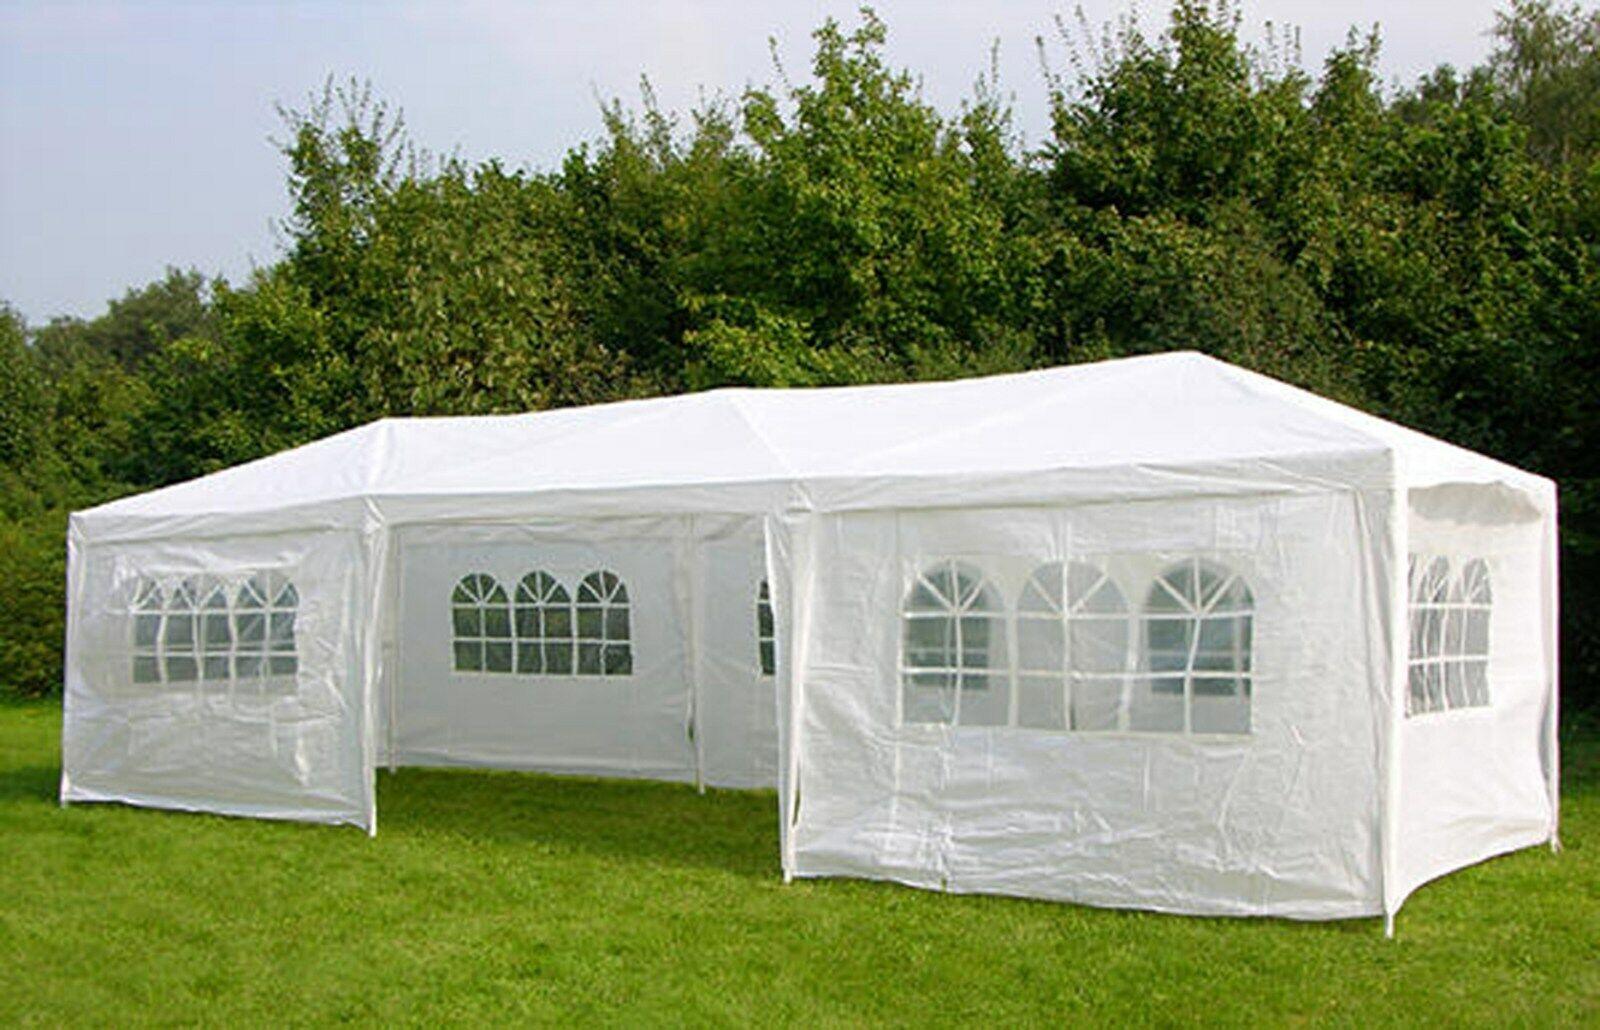 3M X 9 M BIANCO IMPERMEABILE ESTERNO GIARDINO GAZEBO Party Tenda Marquee Canopy NUOVO